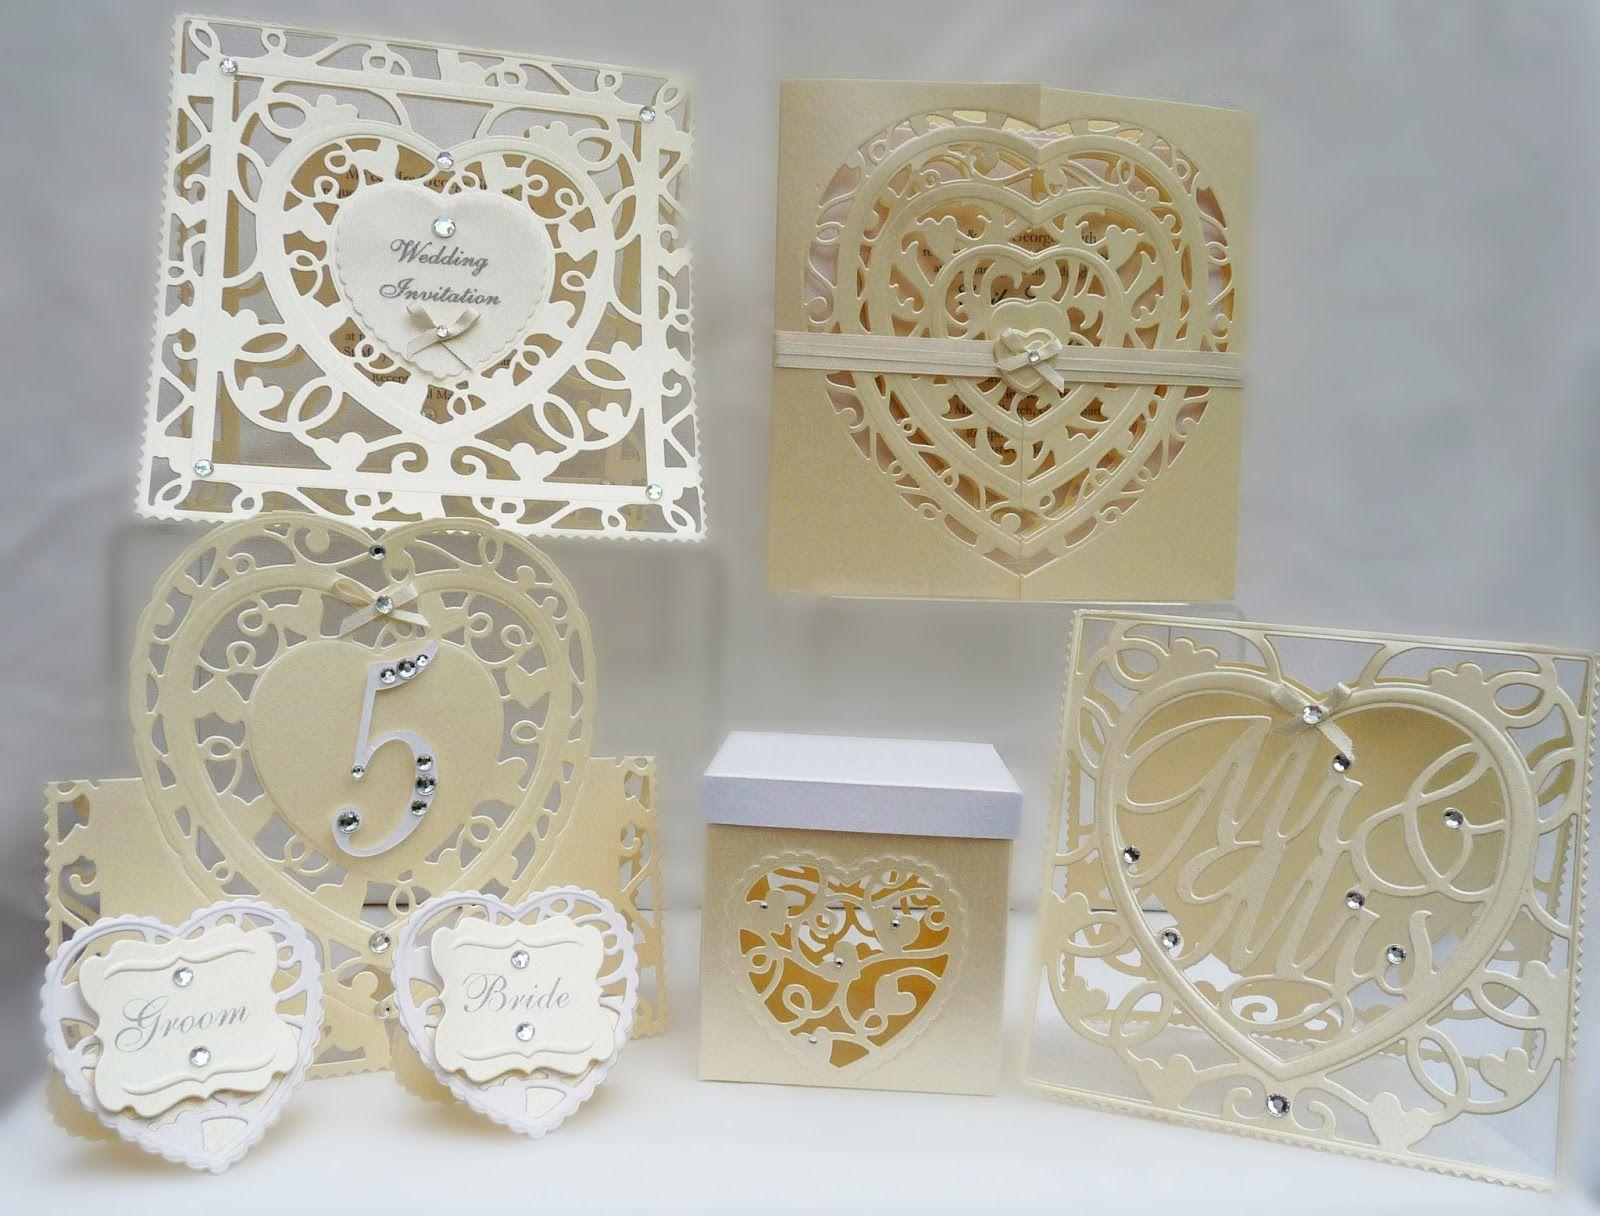 Sneak Peek 7 The Entire Wedding Ensemble Wedding Stationery Wedding Anniversary Cards Wedding Cards